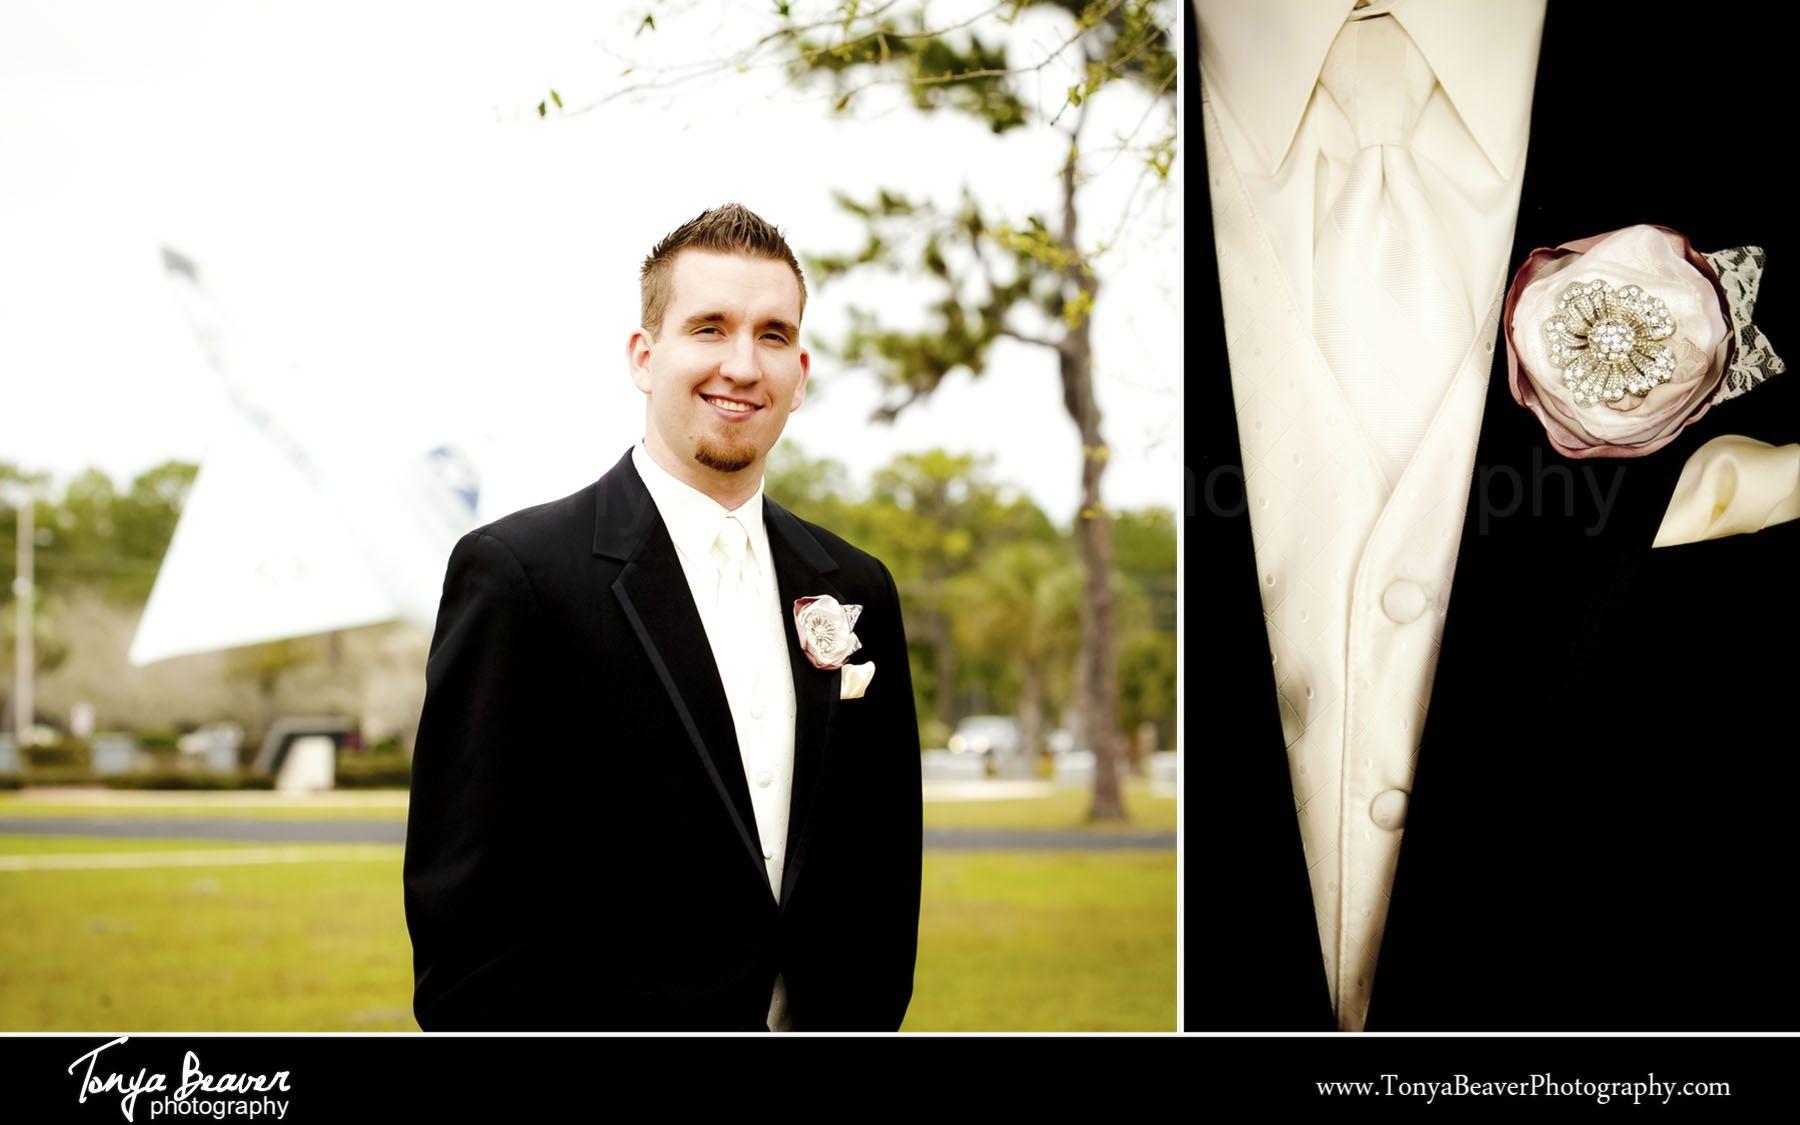 Jacksonville beach weddings  Vintage Wedding Jacksonville FL blognyabeaverphotography